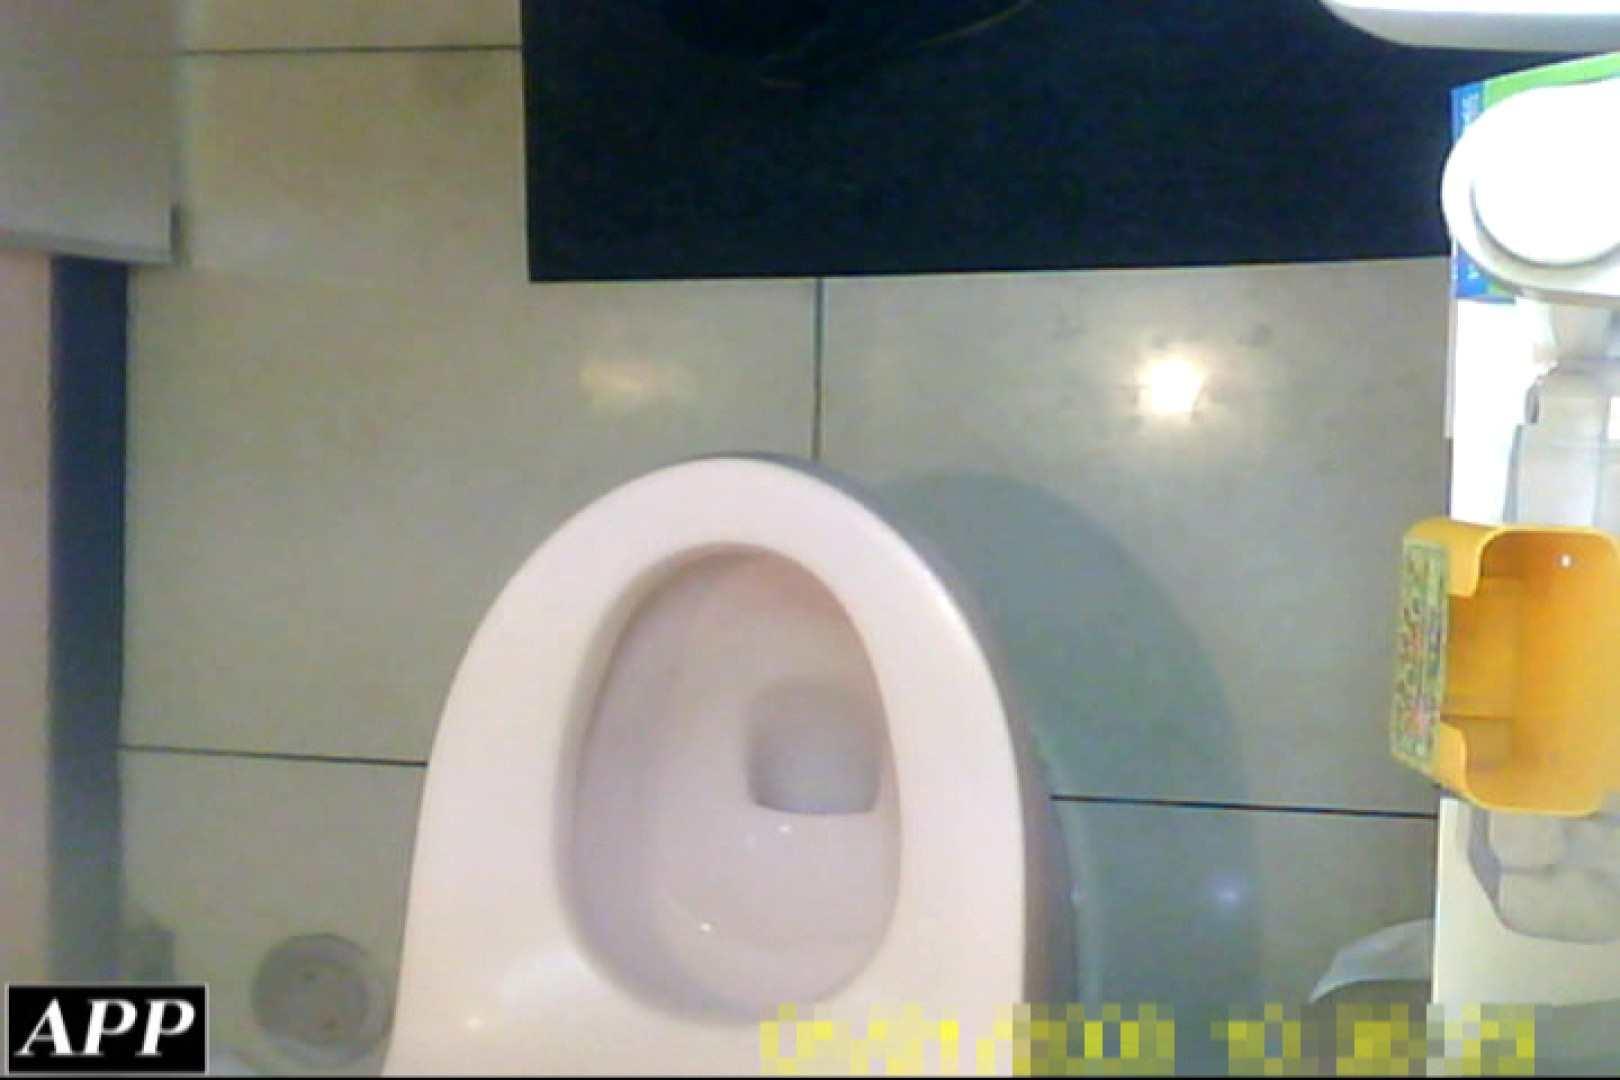 3視点洗面所 vol.053 洗面所 | OLセックス  67画像 17